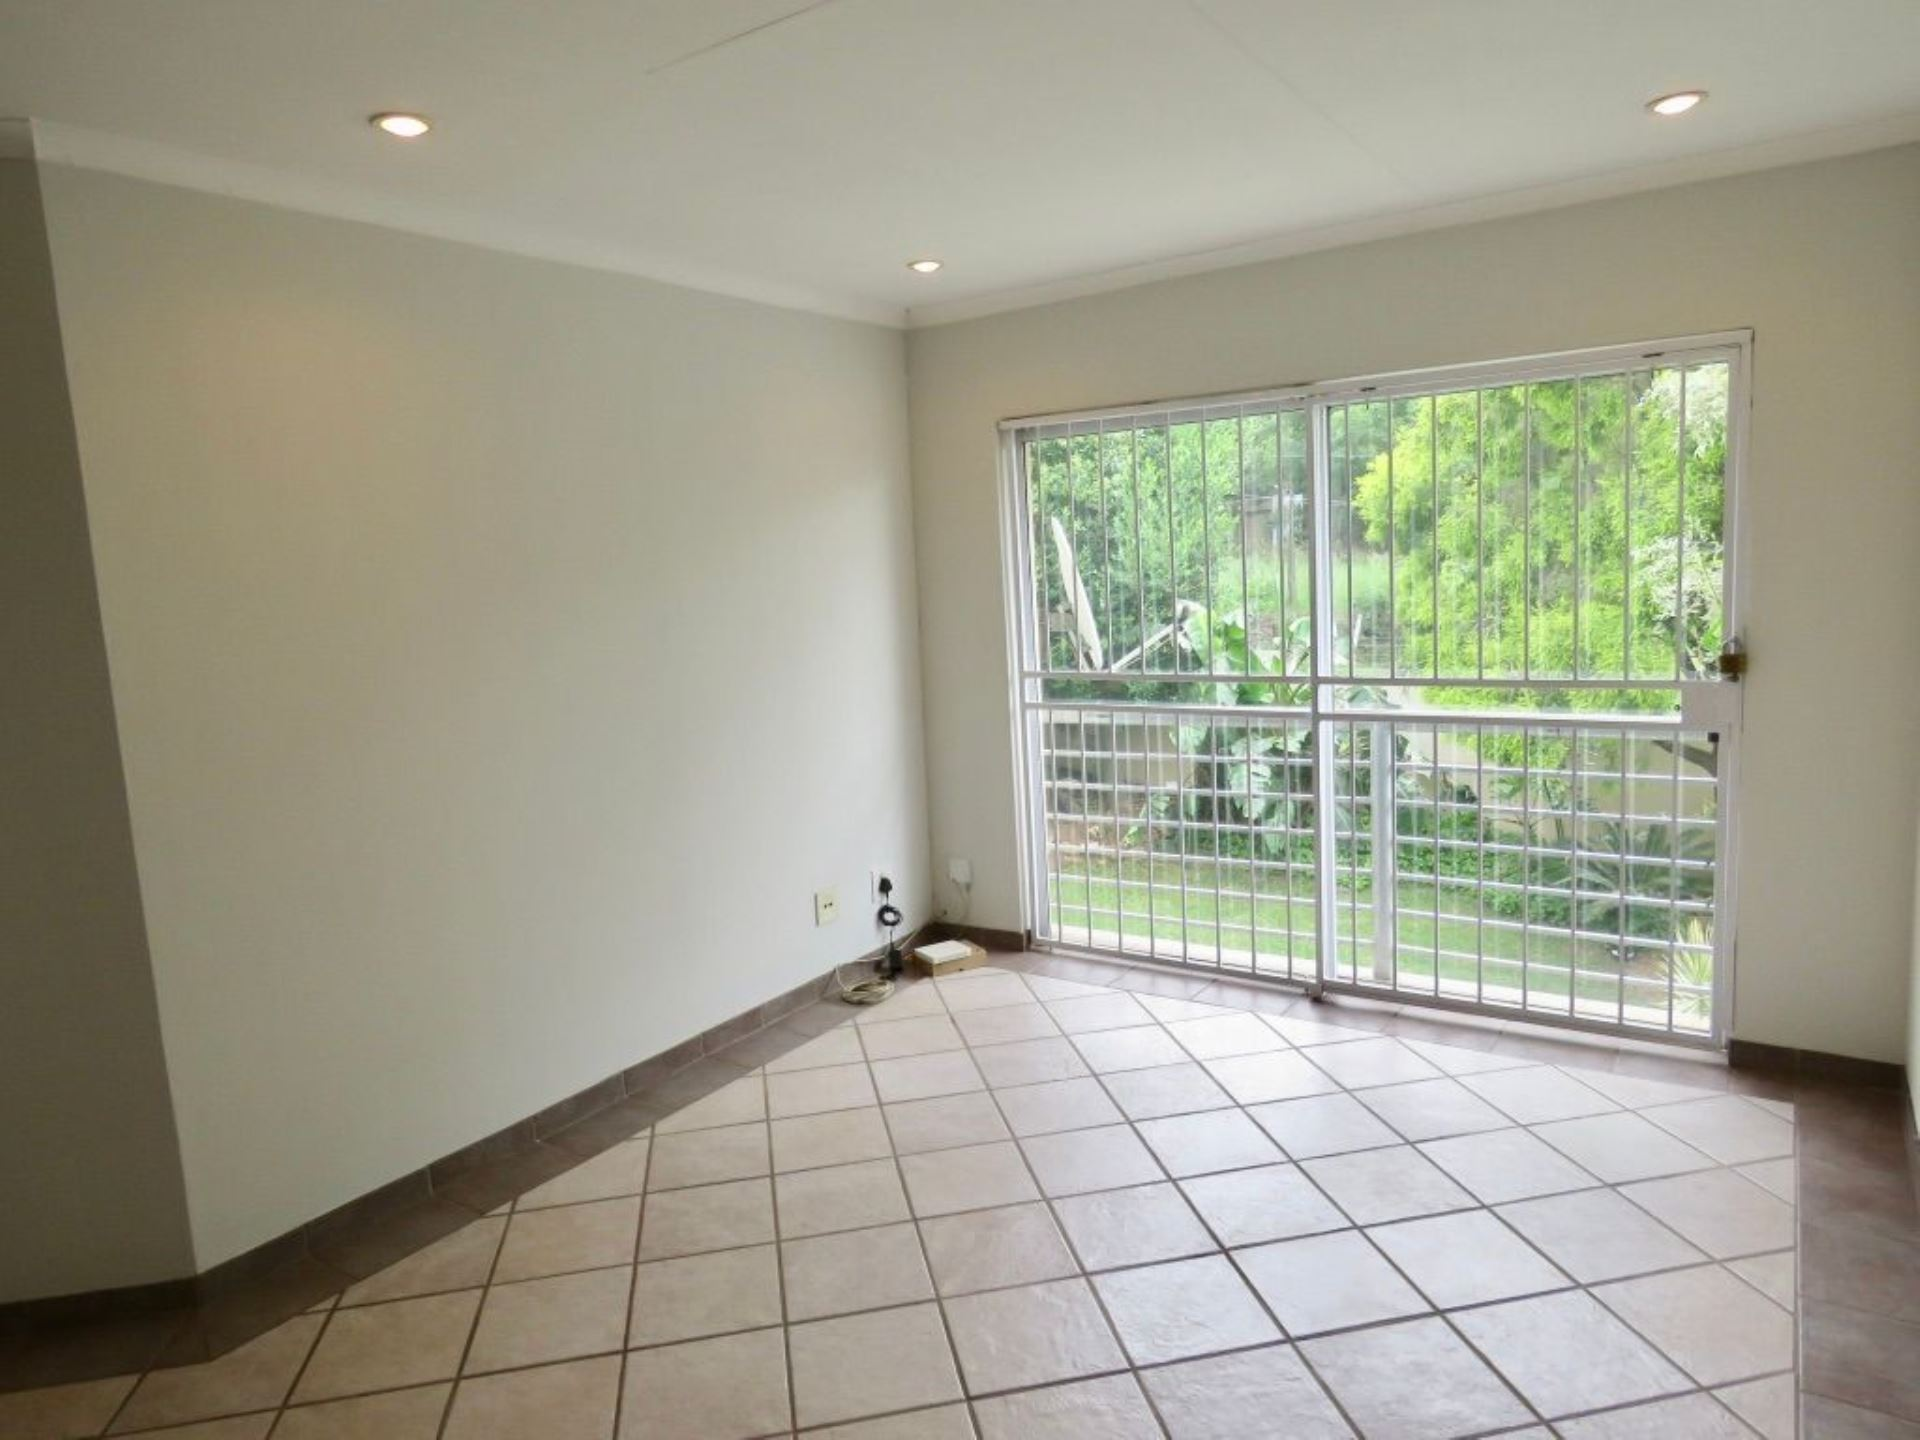 Apartment For Sale in ERASMUSKLOOF